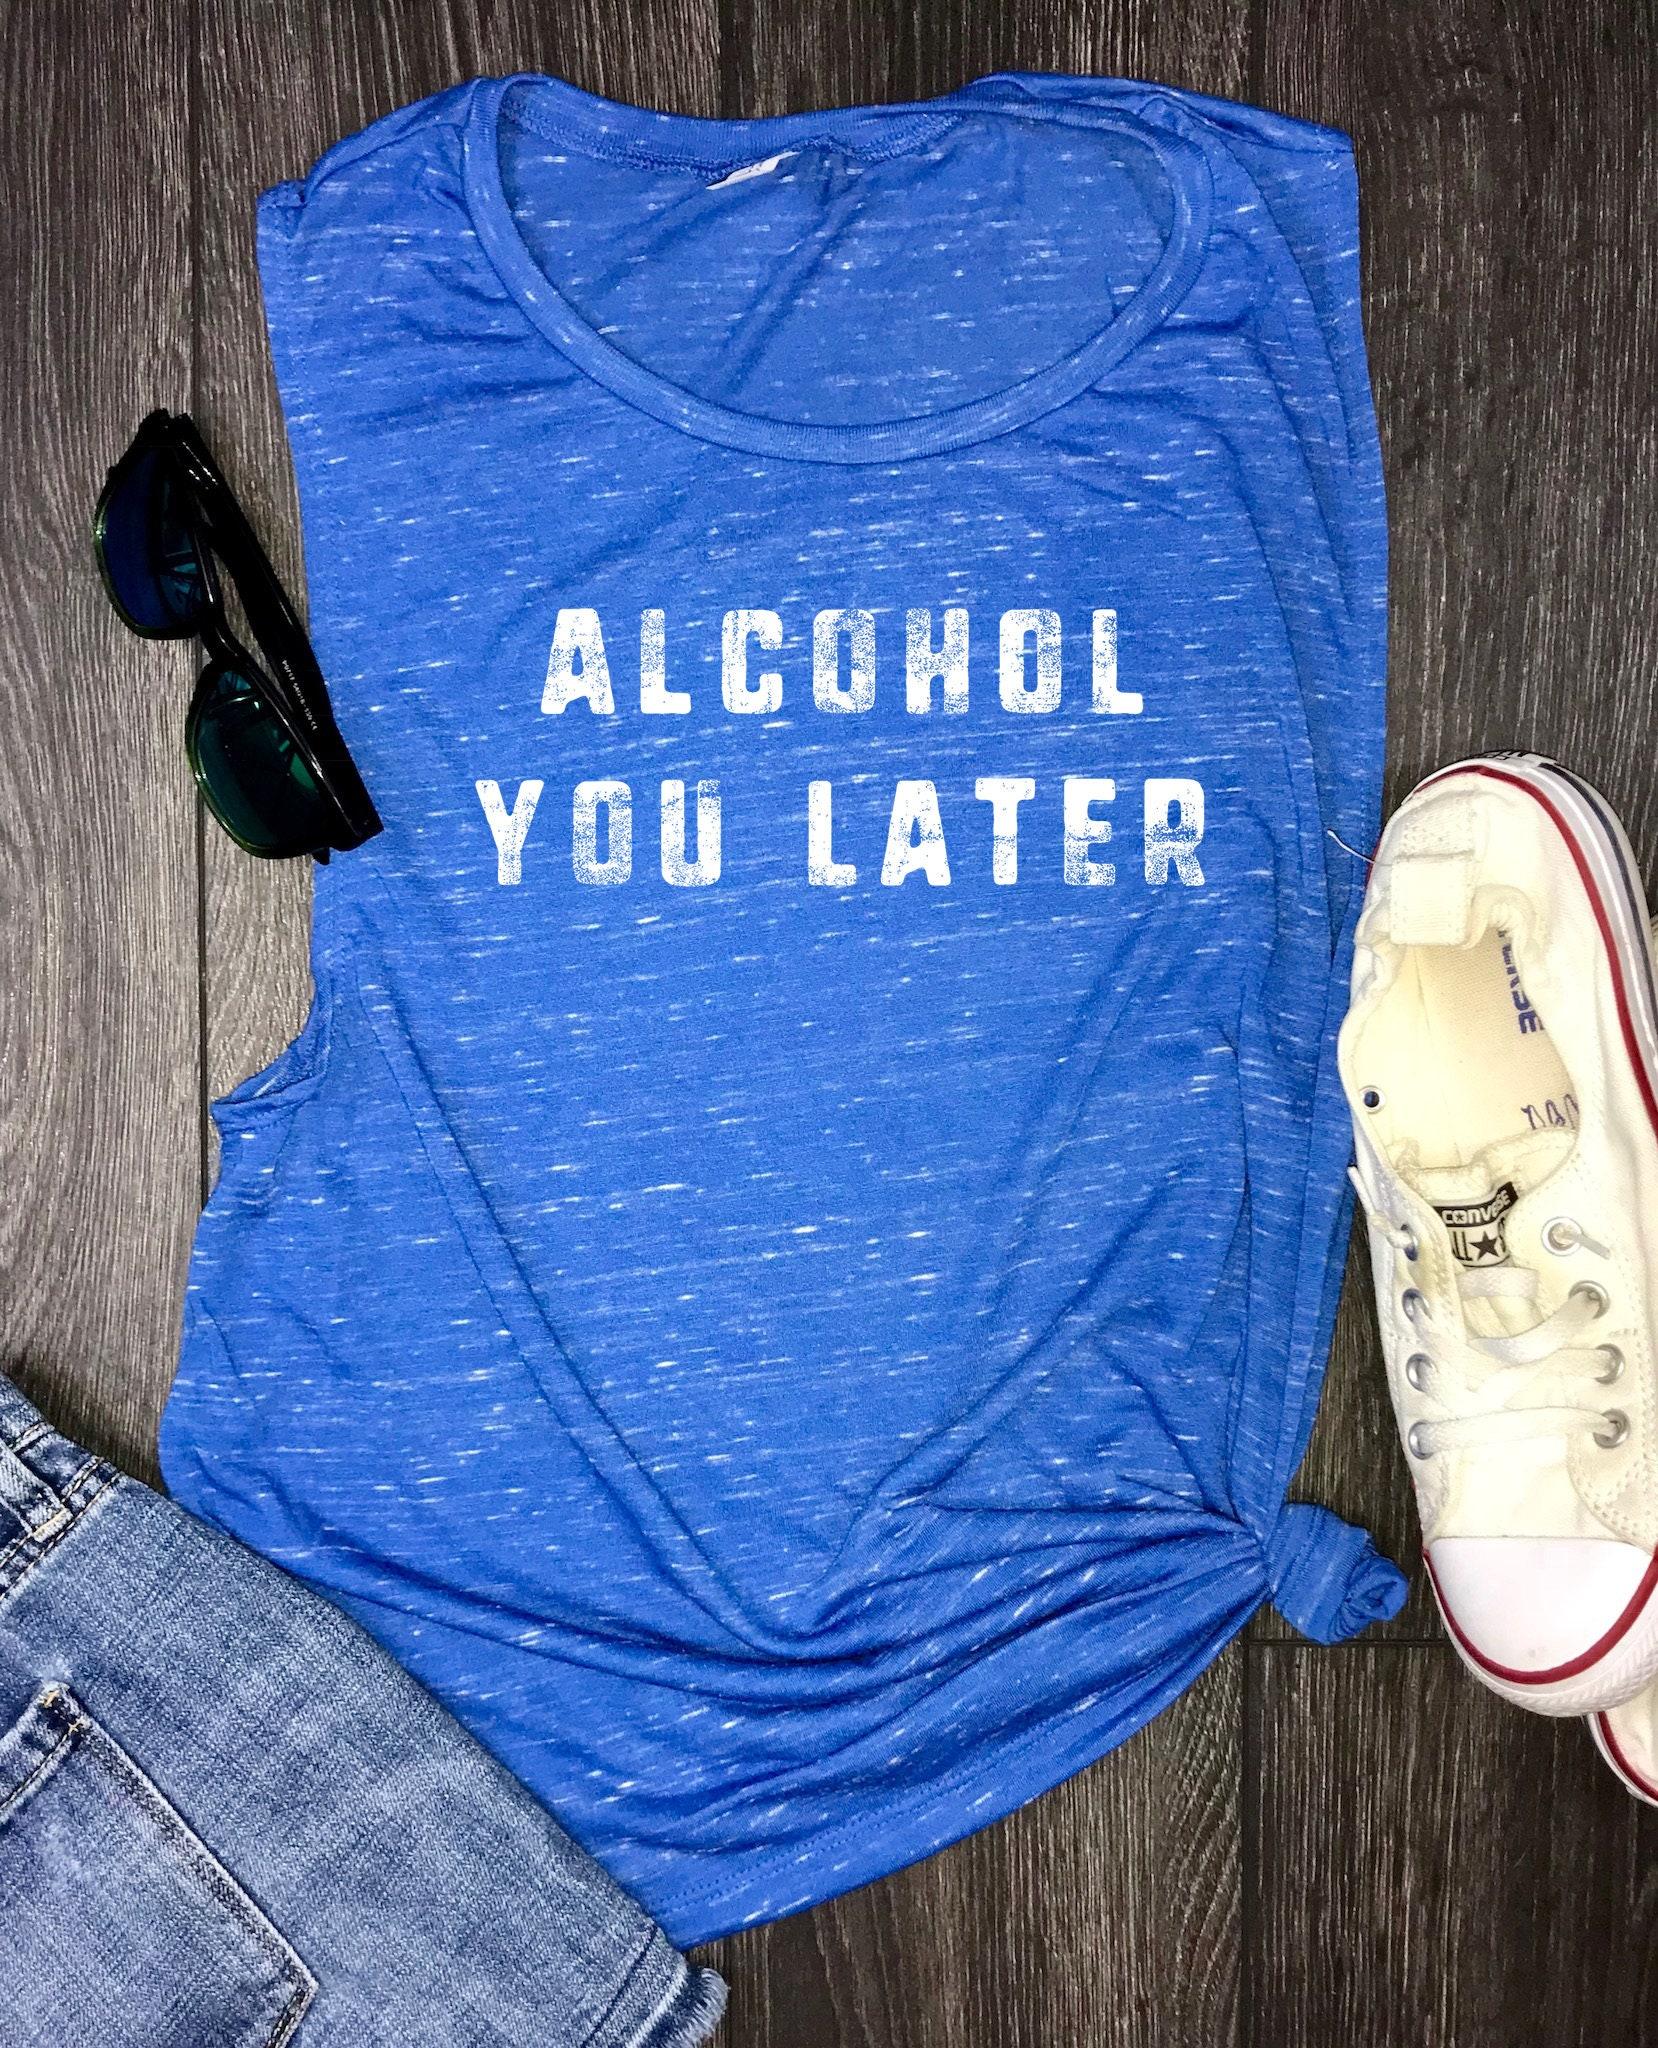 f40bbff1 shenanigans, tomfoolery, funny bride shirts, bridesmaid shirt, drinking  shirts, alcohol you later, vacation shirt, wine shirt, brunch shirt